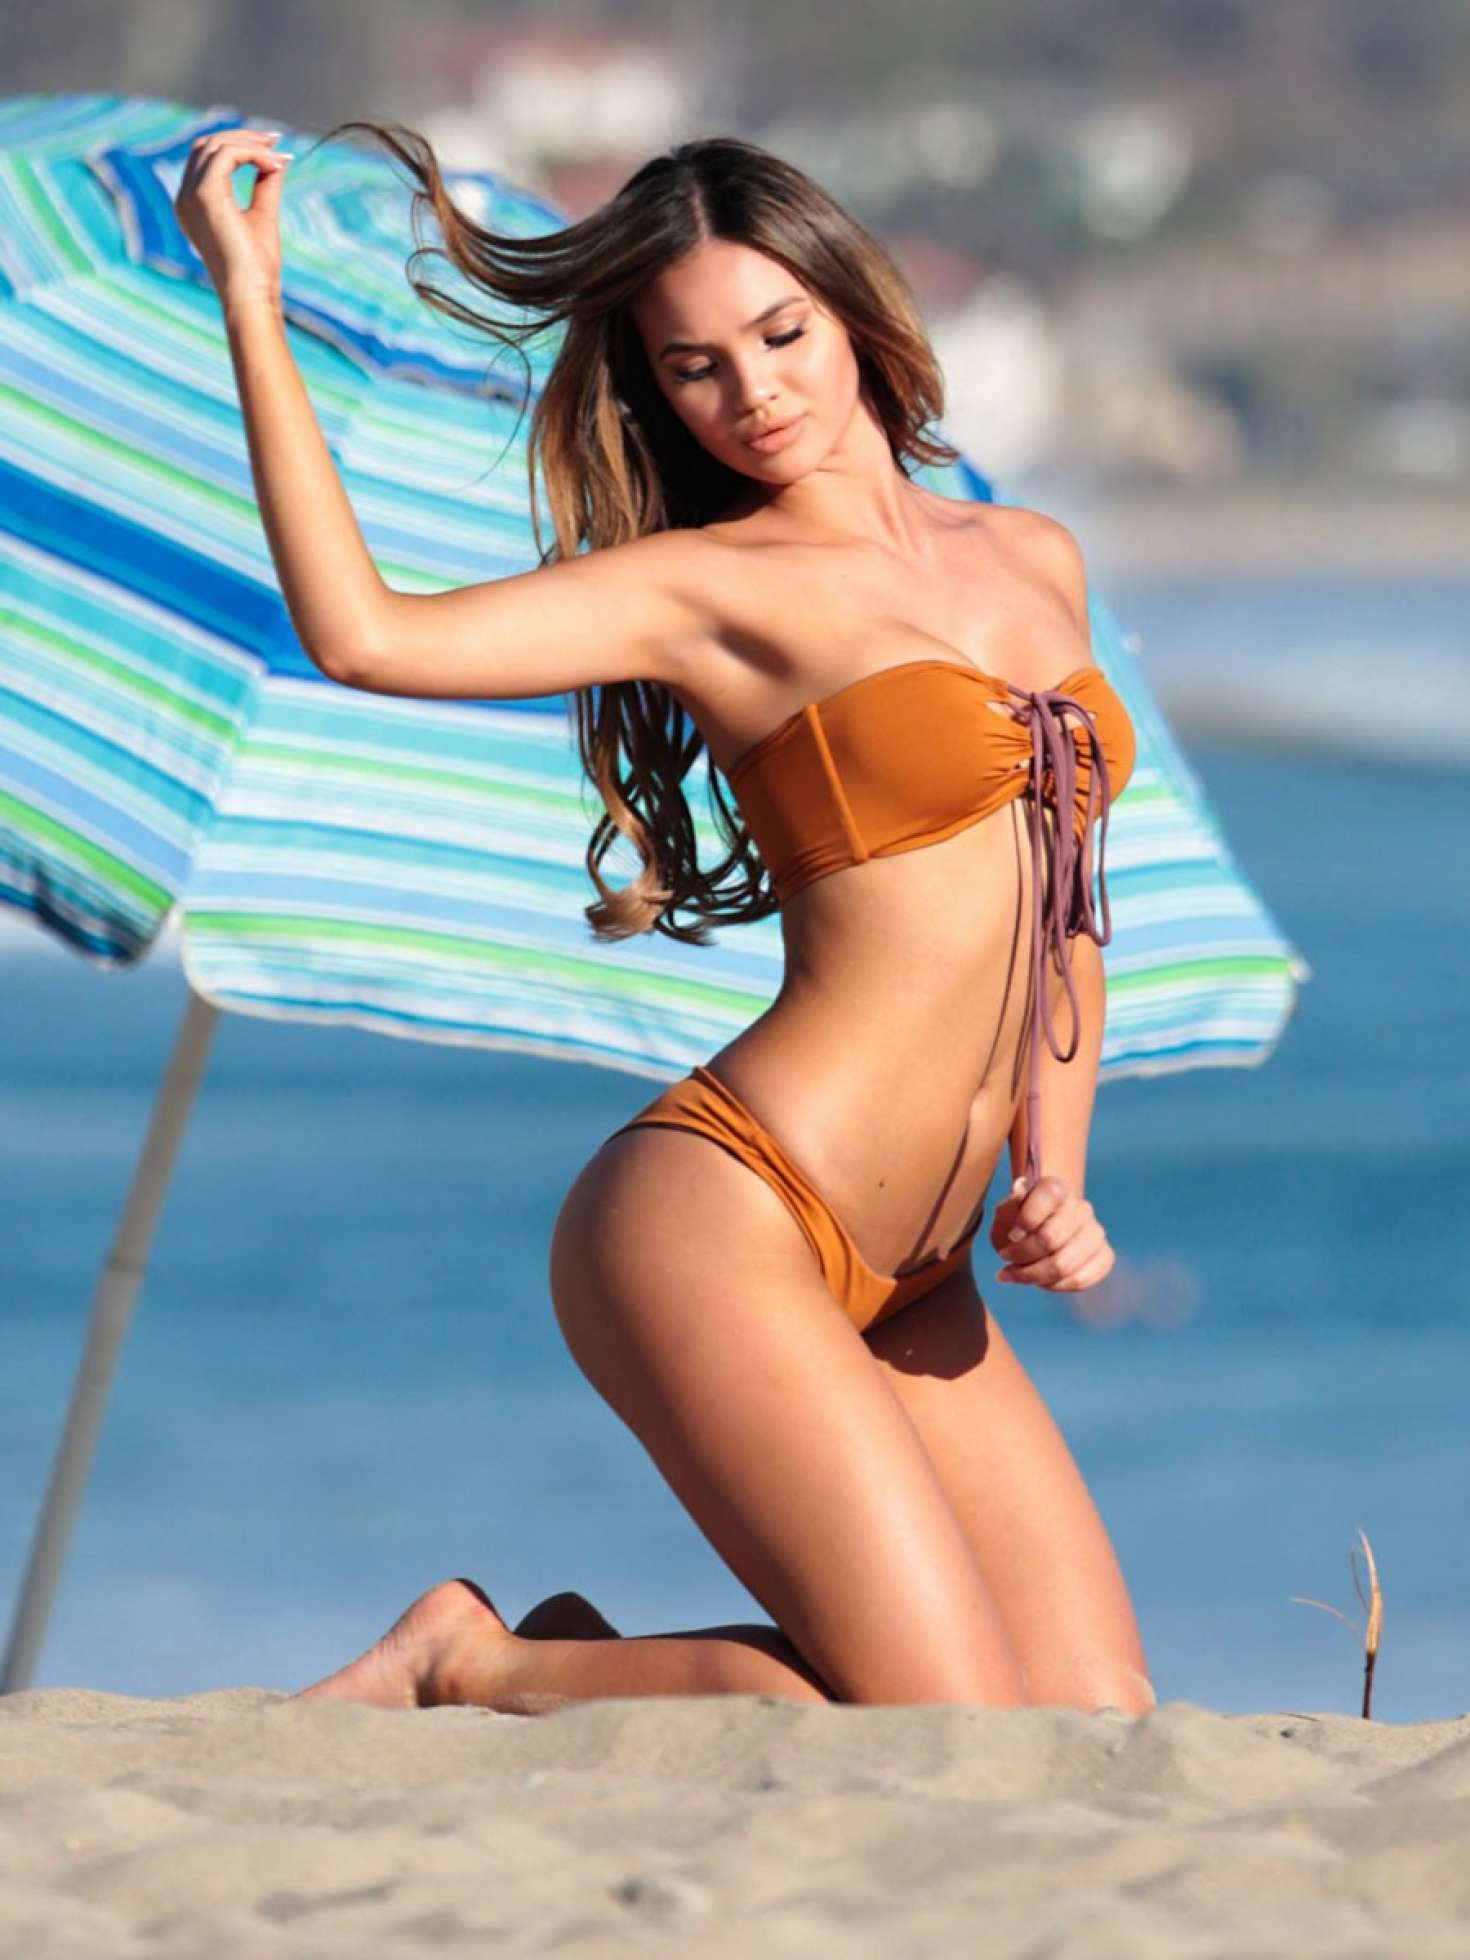 Nina dobrev bikini beach tits and ass pics